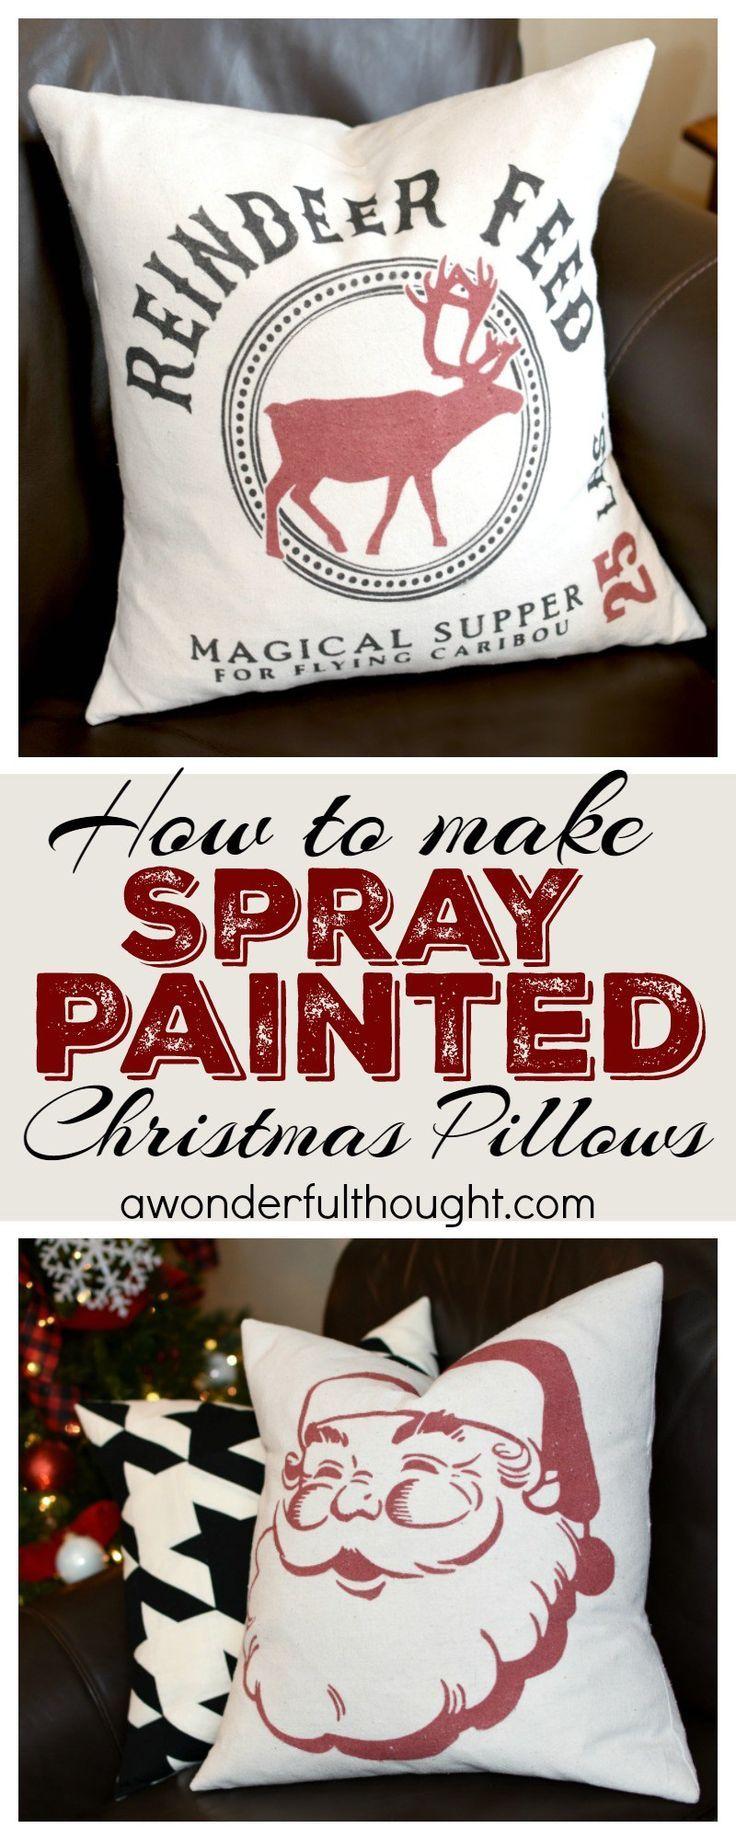 DIY Spray Painted Christmas Pillows Christmas pillow